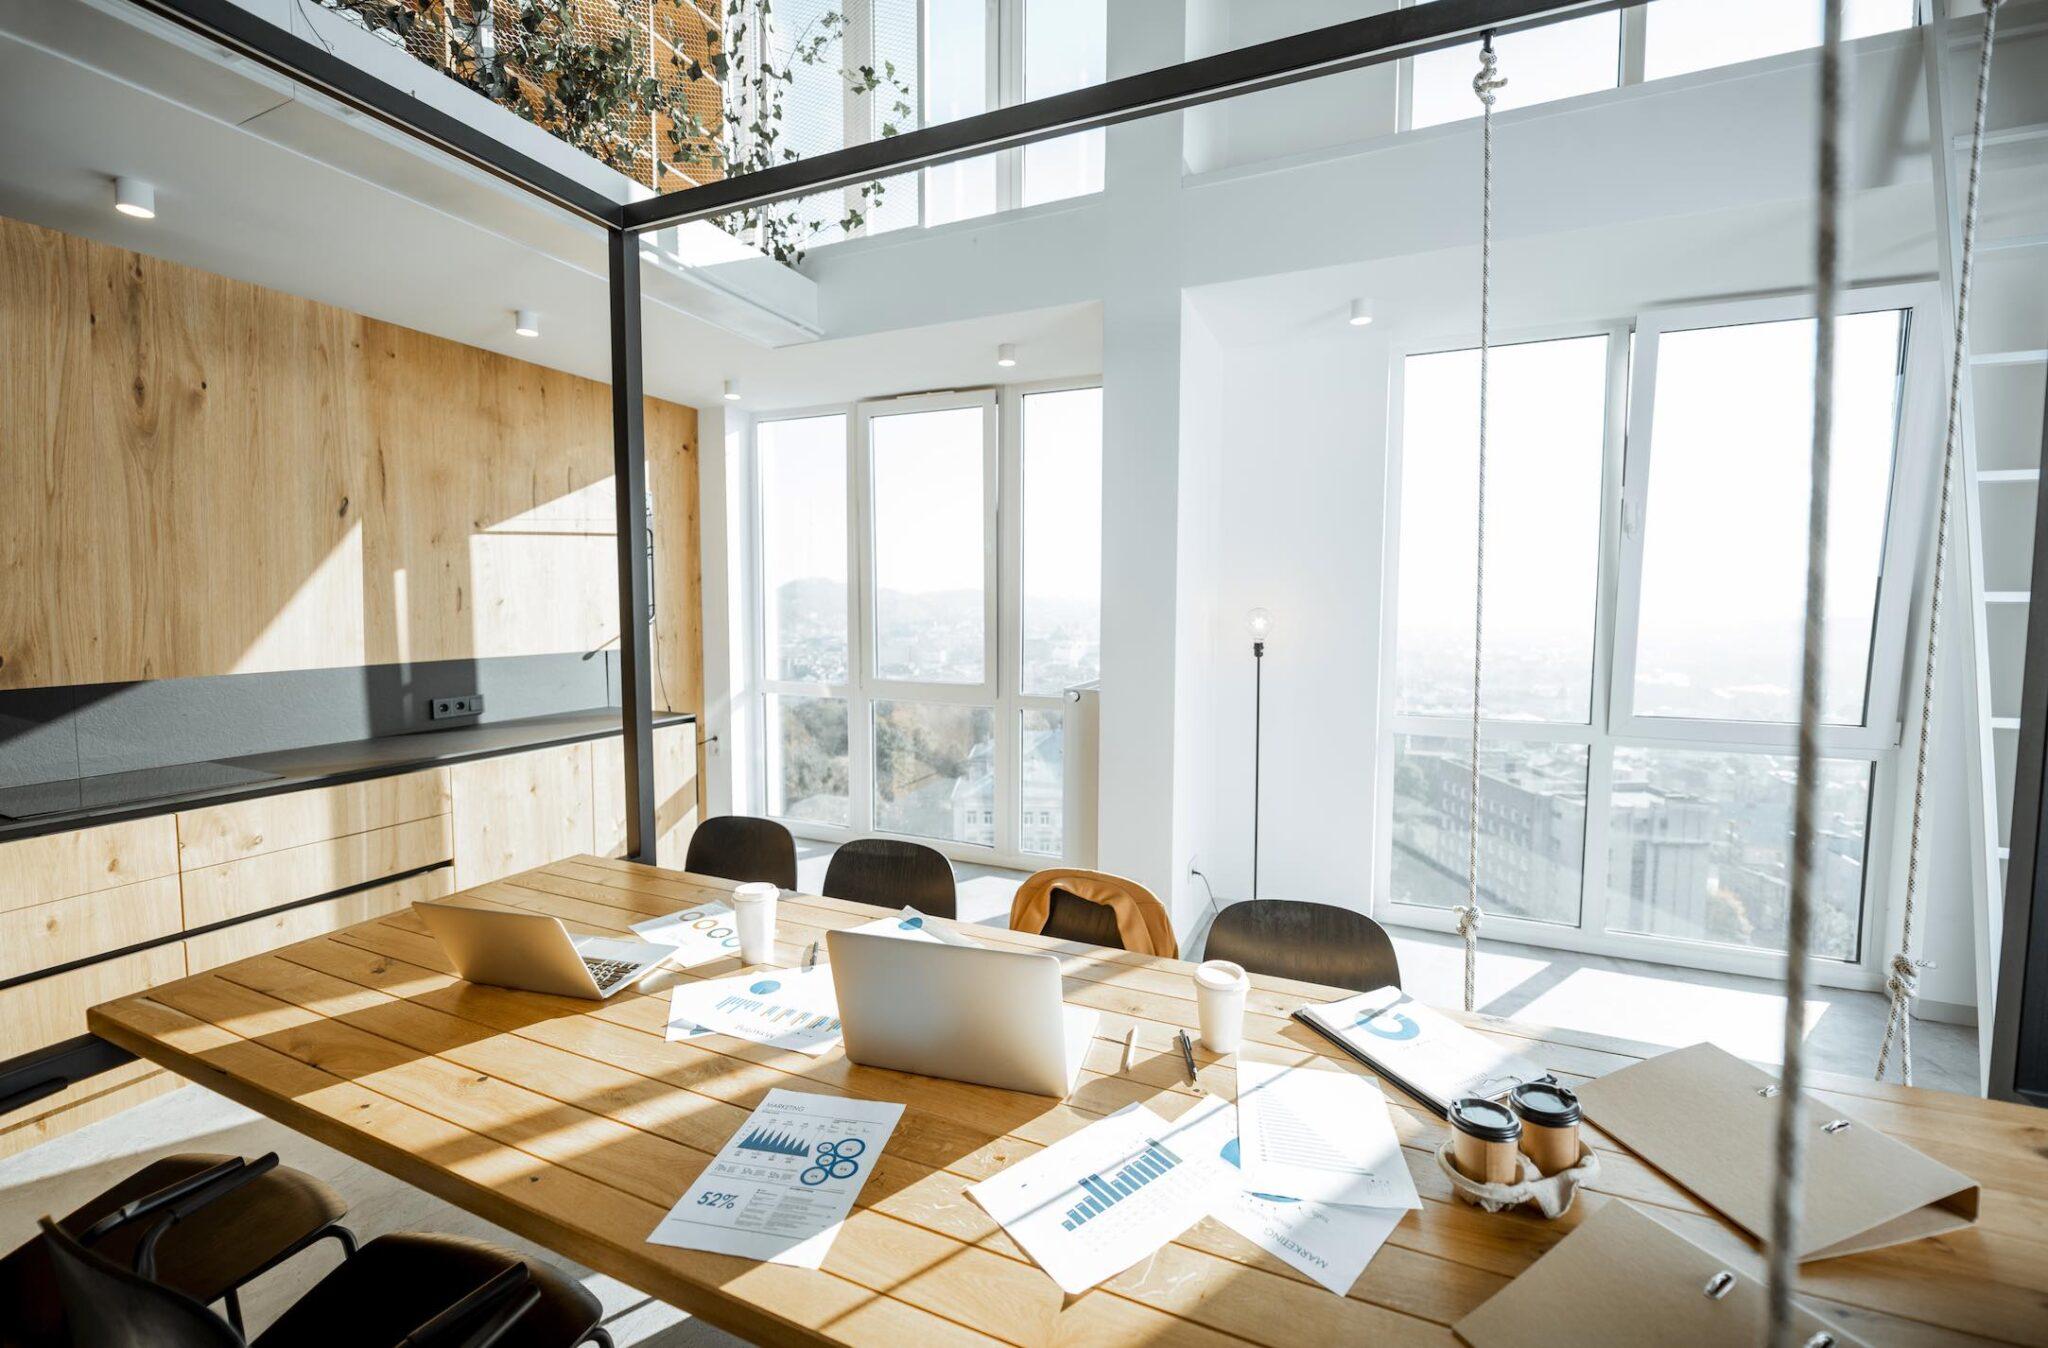 Window Film Retrofit Upgrades Glass According To Architect Magazine - Commercial Window Film and Window Tinting in Western Michigan